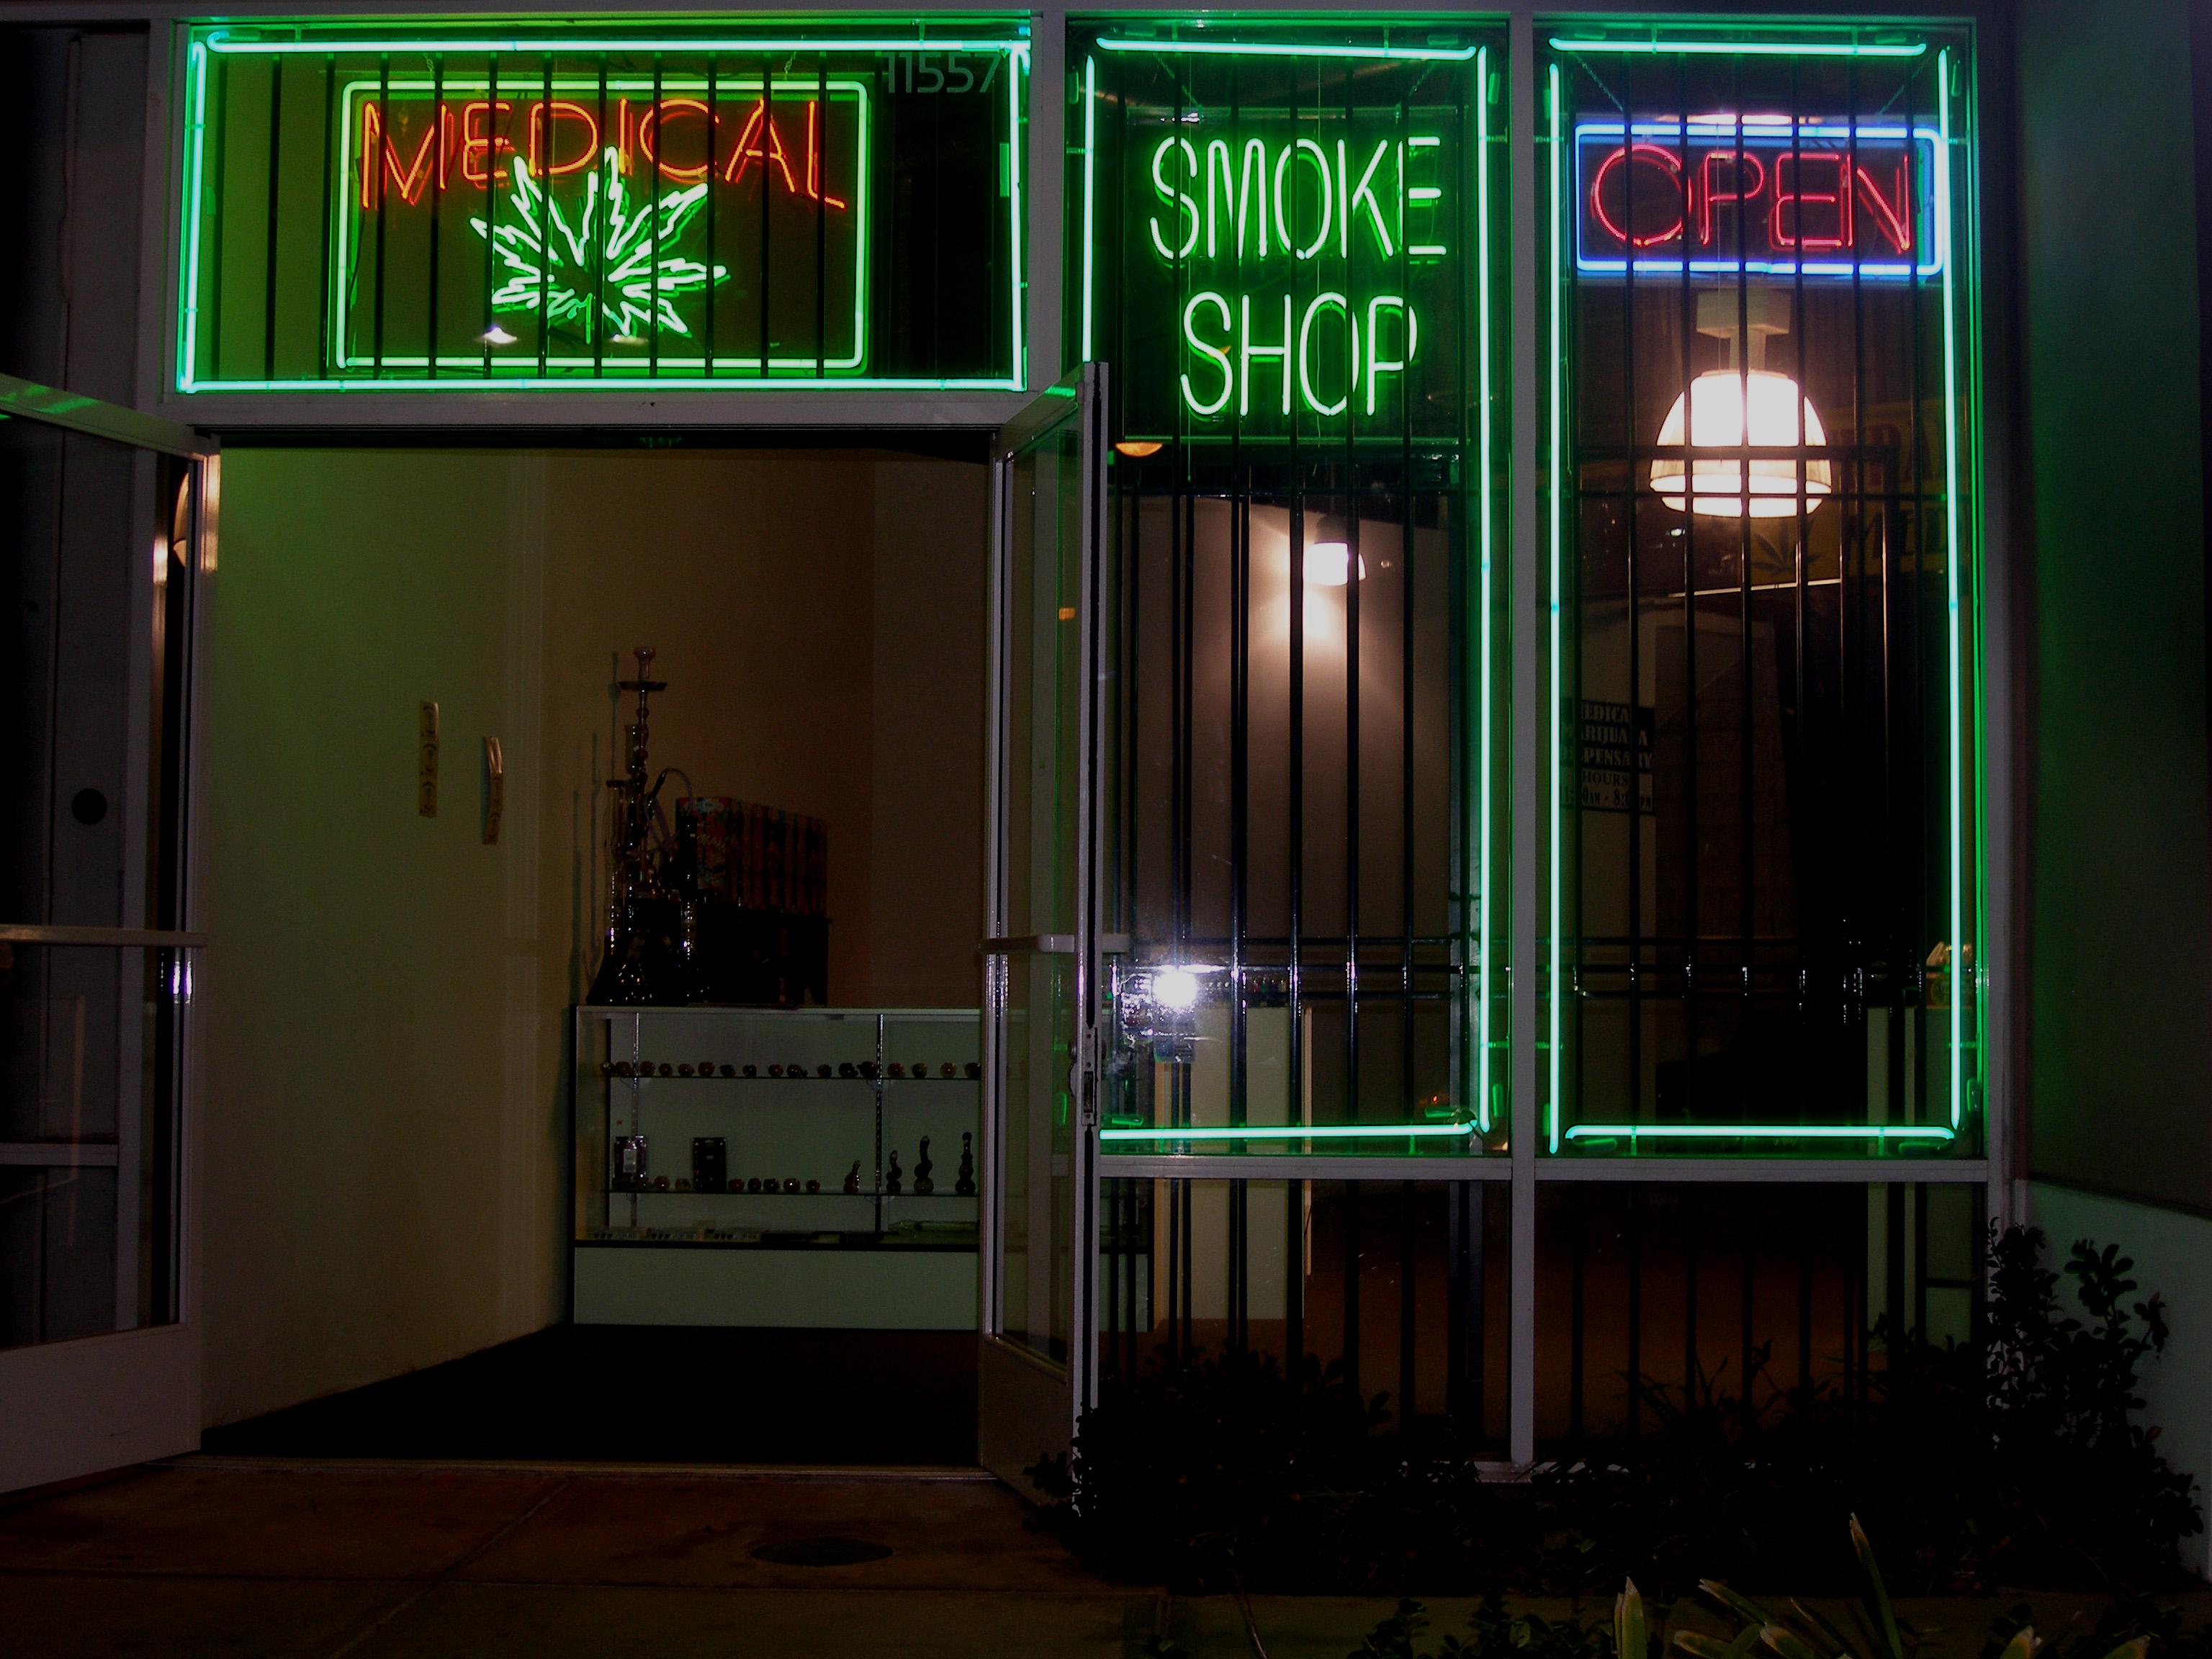 Image of marijuana shop in San Fernando Valley, California